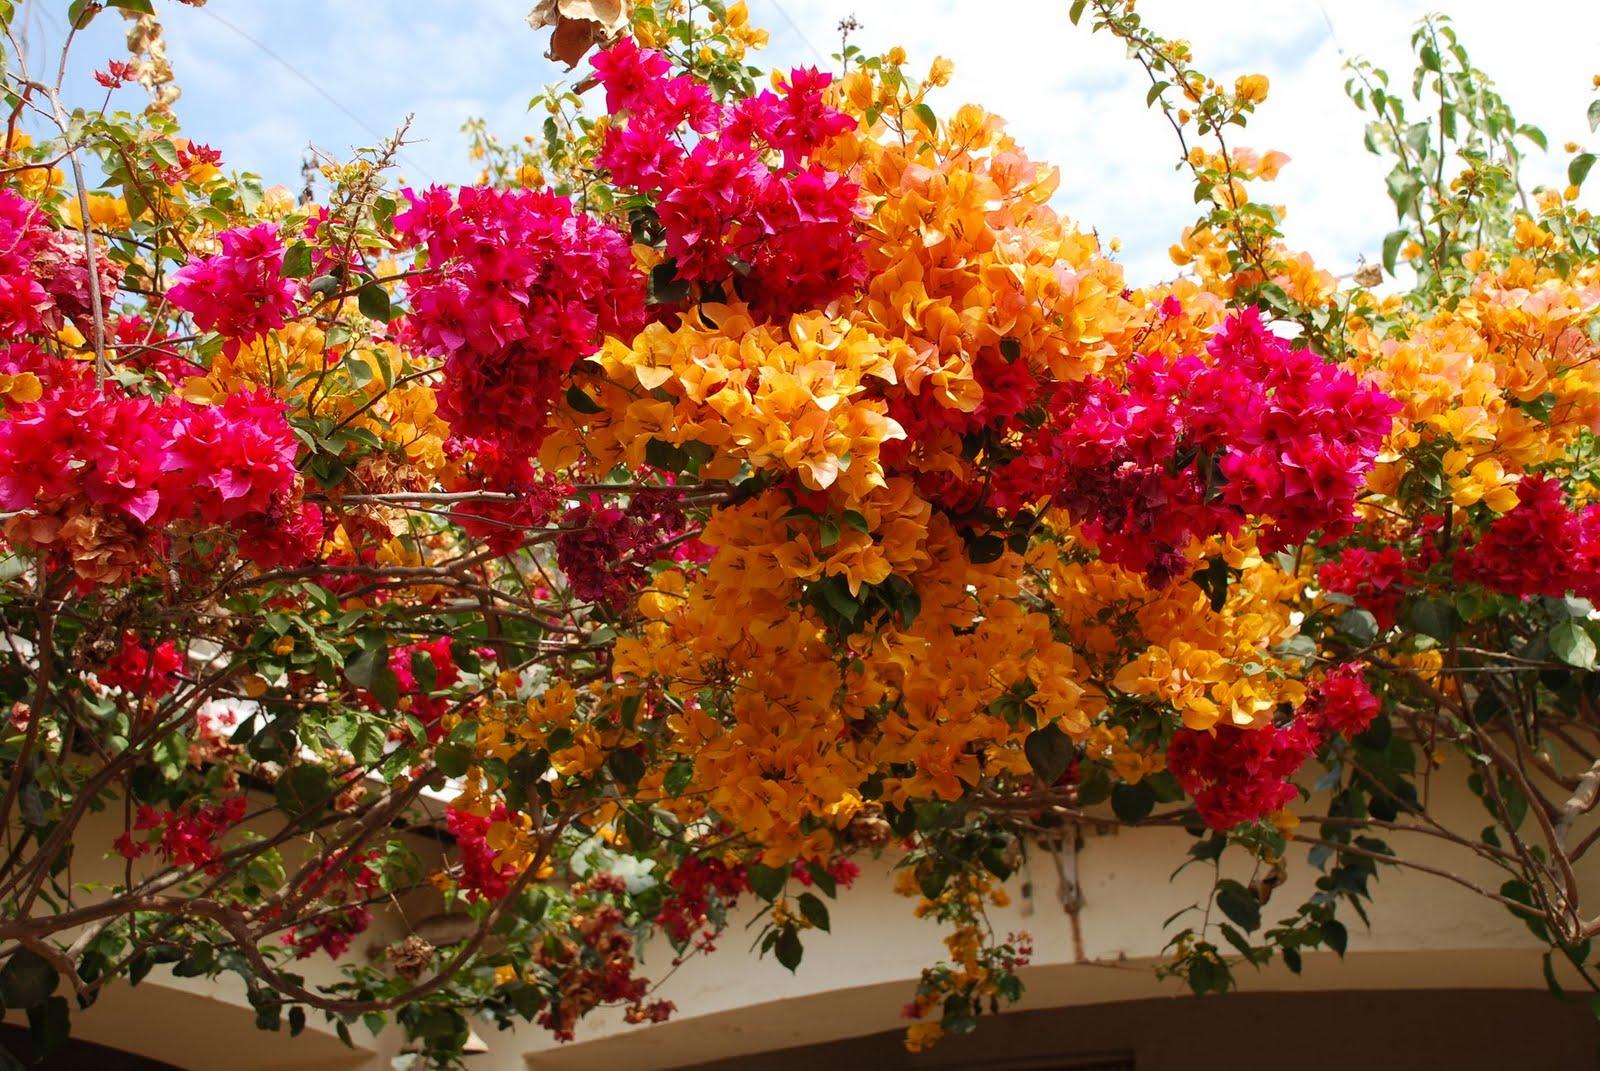 aguaray - ofm: Primavera en Aguaray